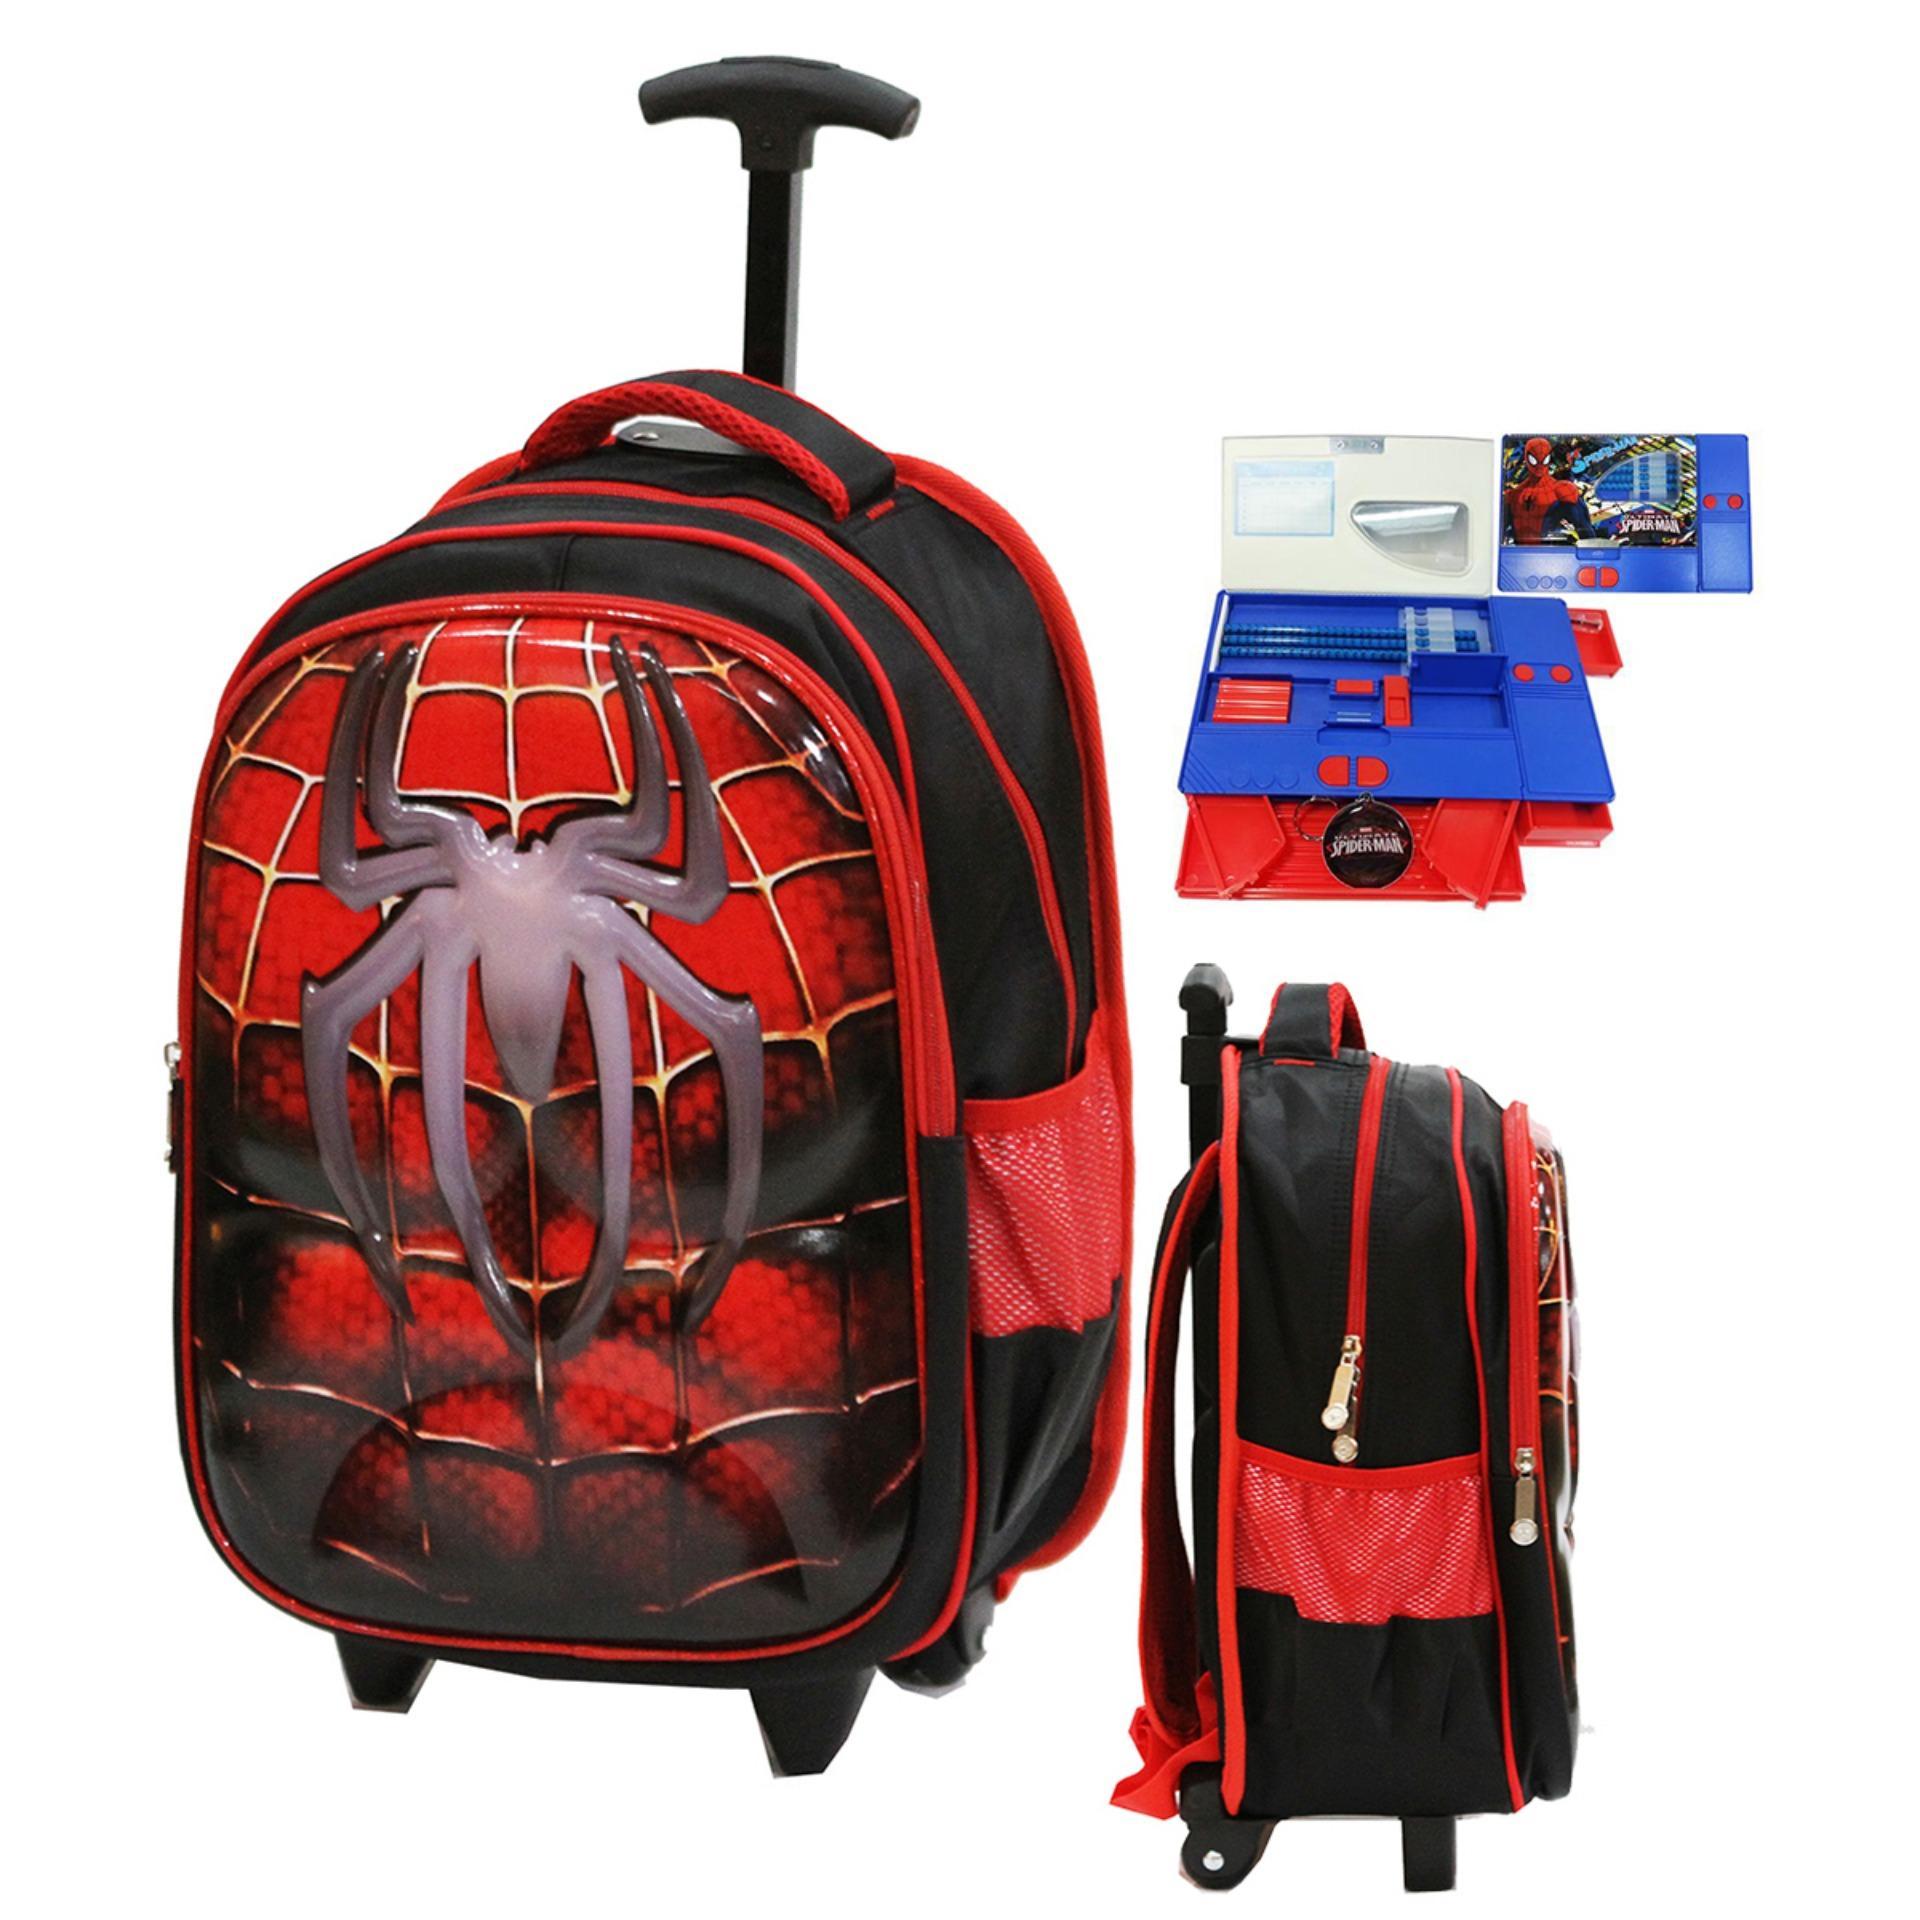 Onlan Spiderman Laba Laba 6D Soft Hard Cover Timbul Tas Trolley Anak SD Import + Kotak Pensil Magnet Jumbo - Red